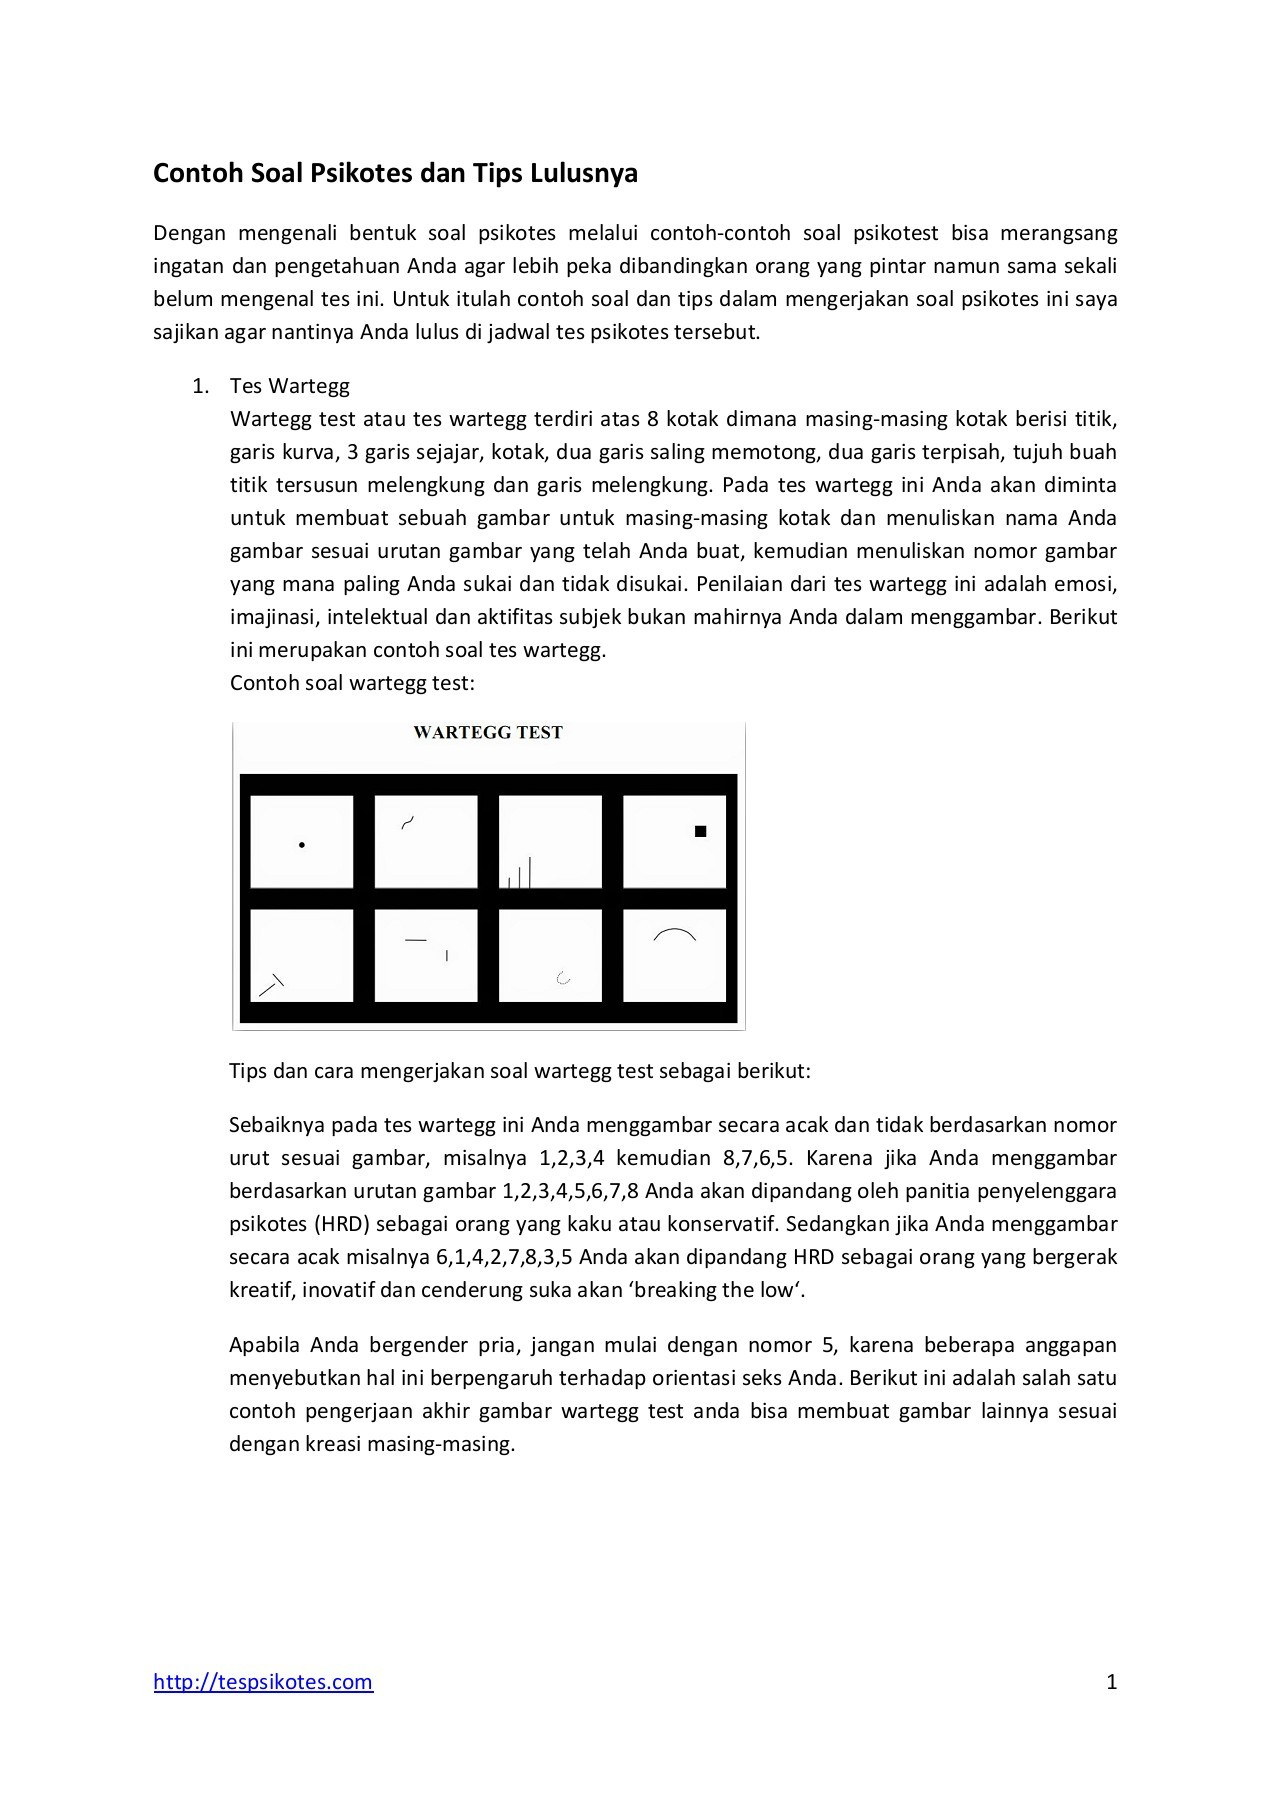 Contoh Soal Psikotes Gambar : contoh, psikotes, gambar, Contoh, Psikotes, Gambar, Jawabannya, Kumpulan, Materi, Pelajaran